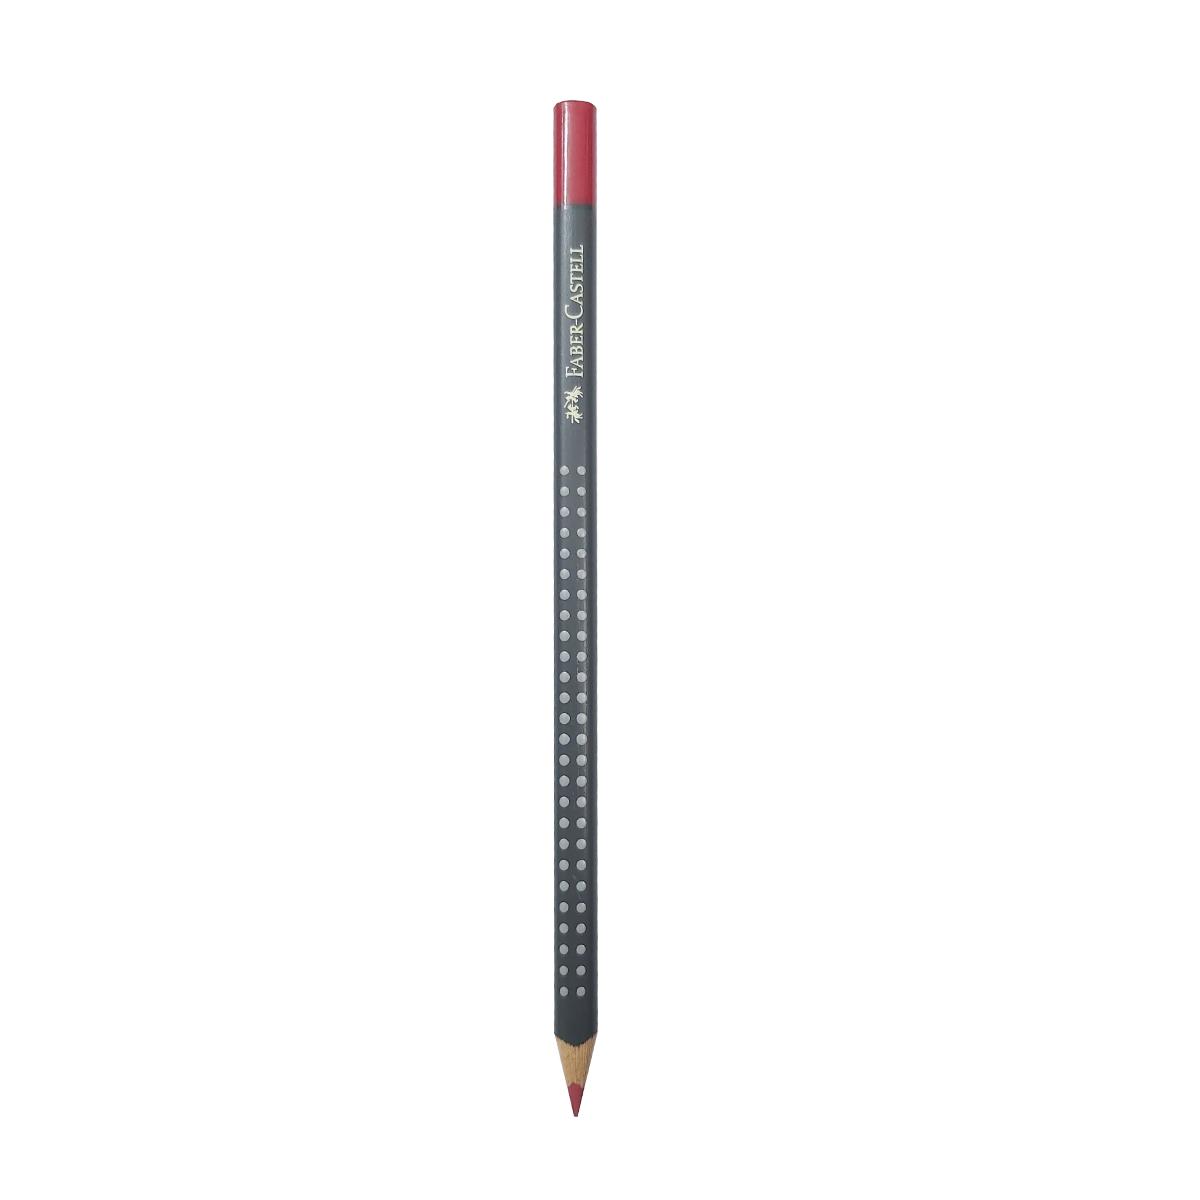 مداد رنگی فابر کاستل  مدل آرت گریپ کد   126